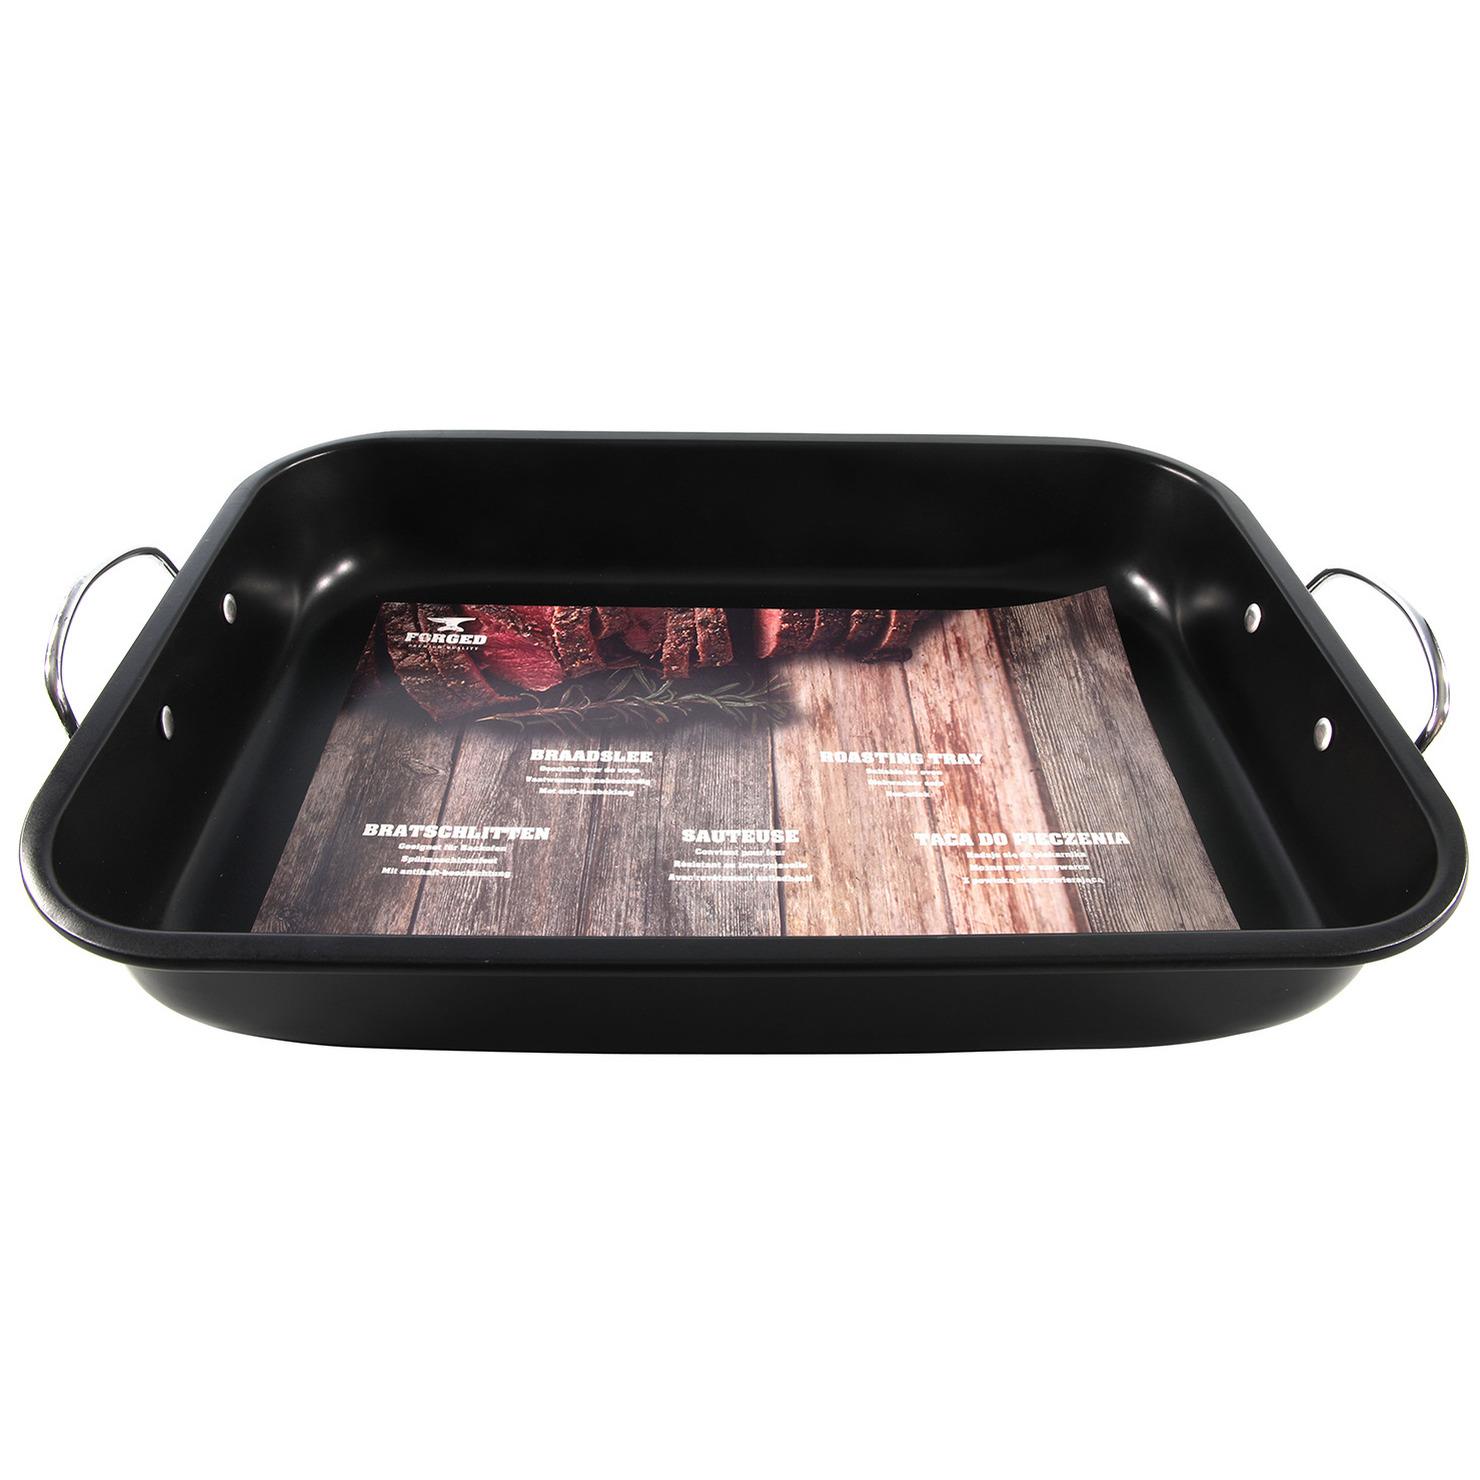 Zwarte ovenbraadpan/braadslede 39 x 29 cm rvs